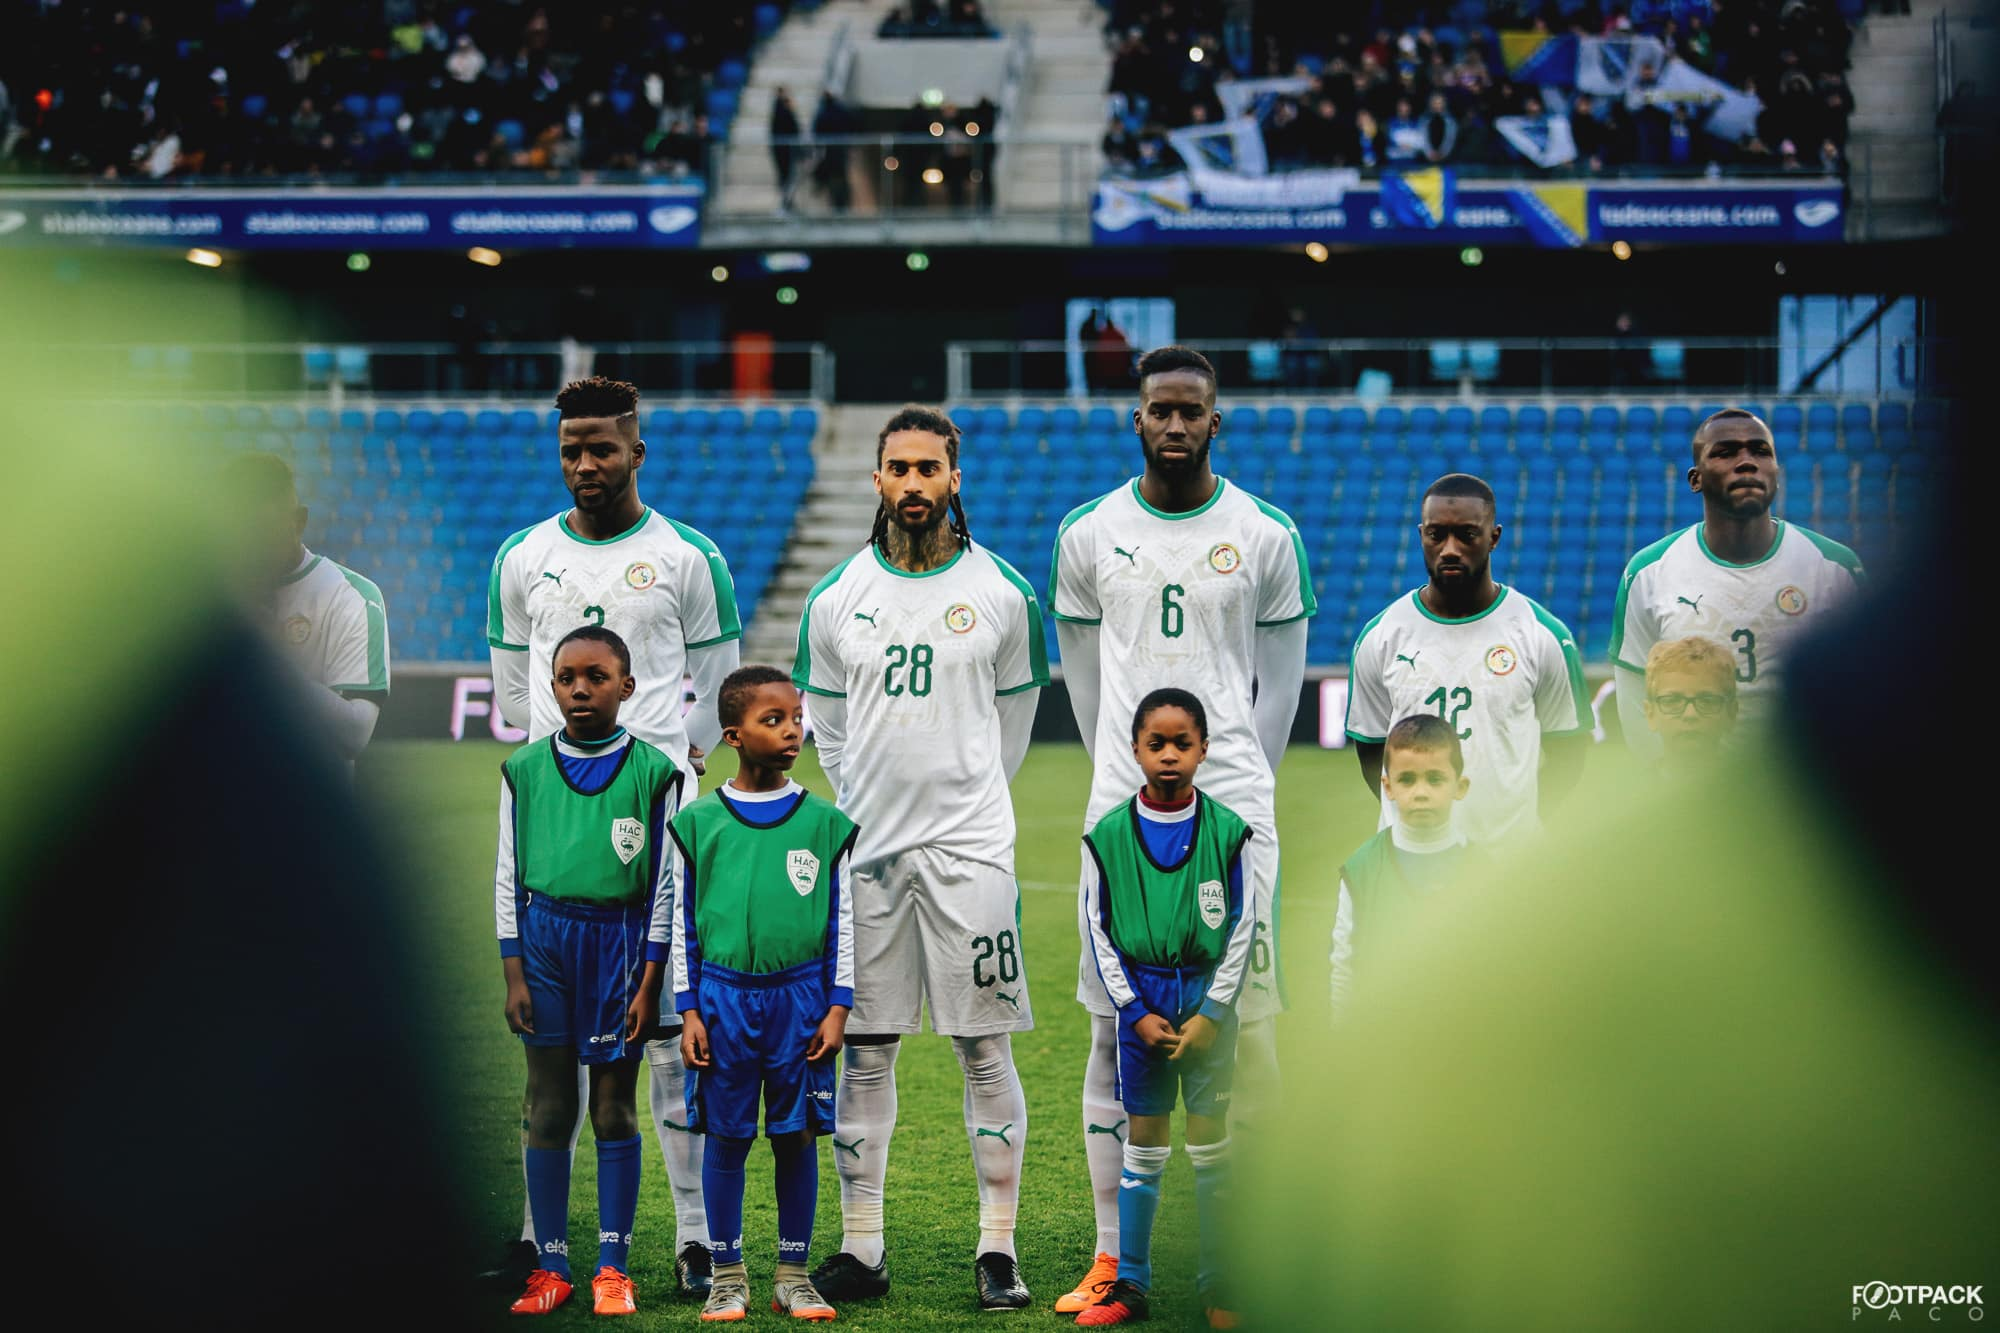 au-stade-senegal-bosnie-mars-2018-9